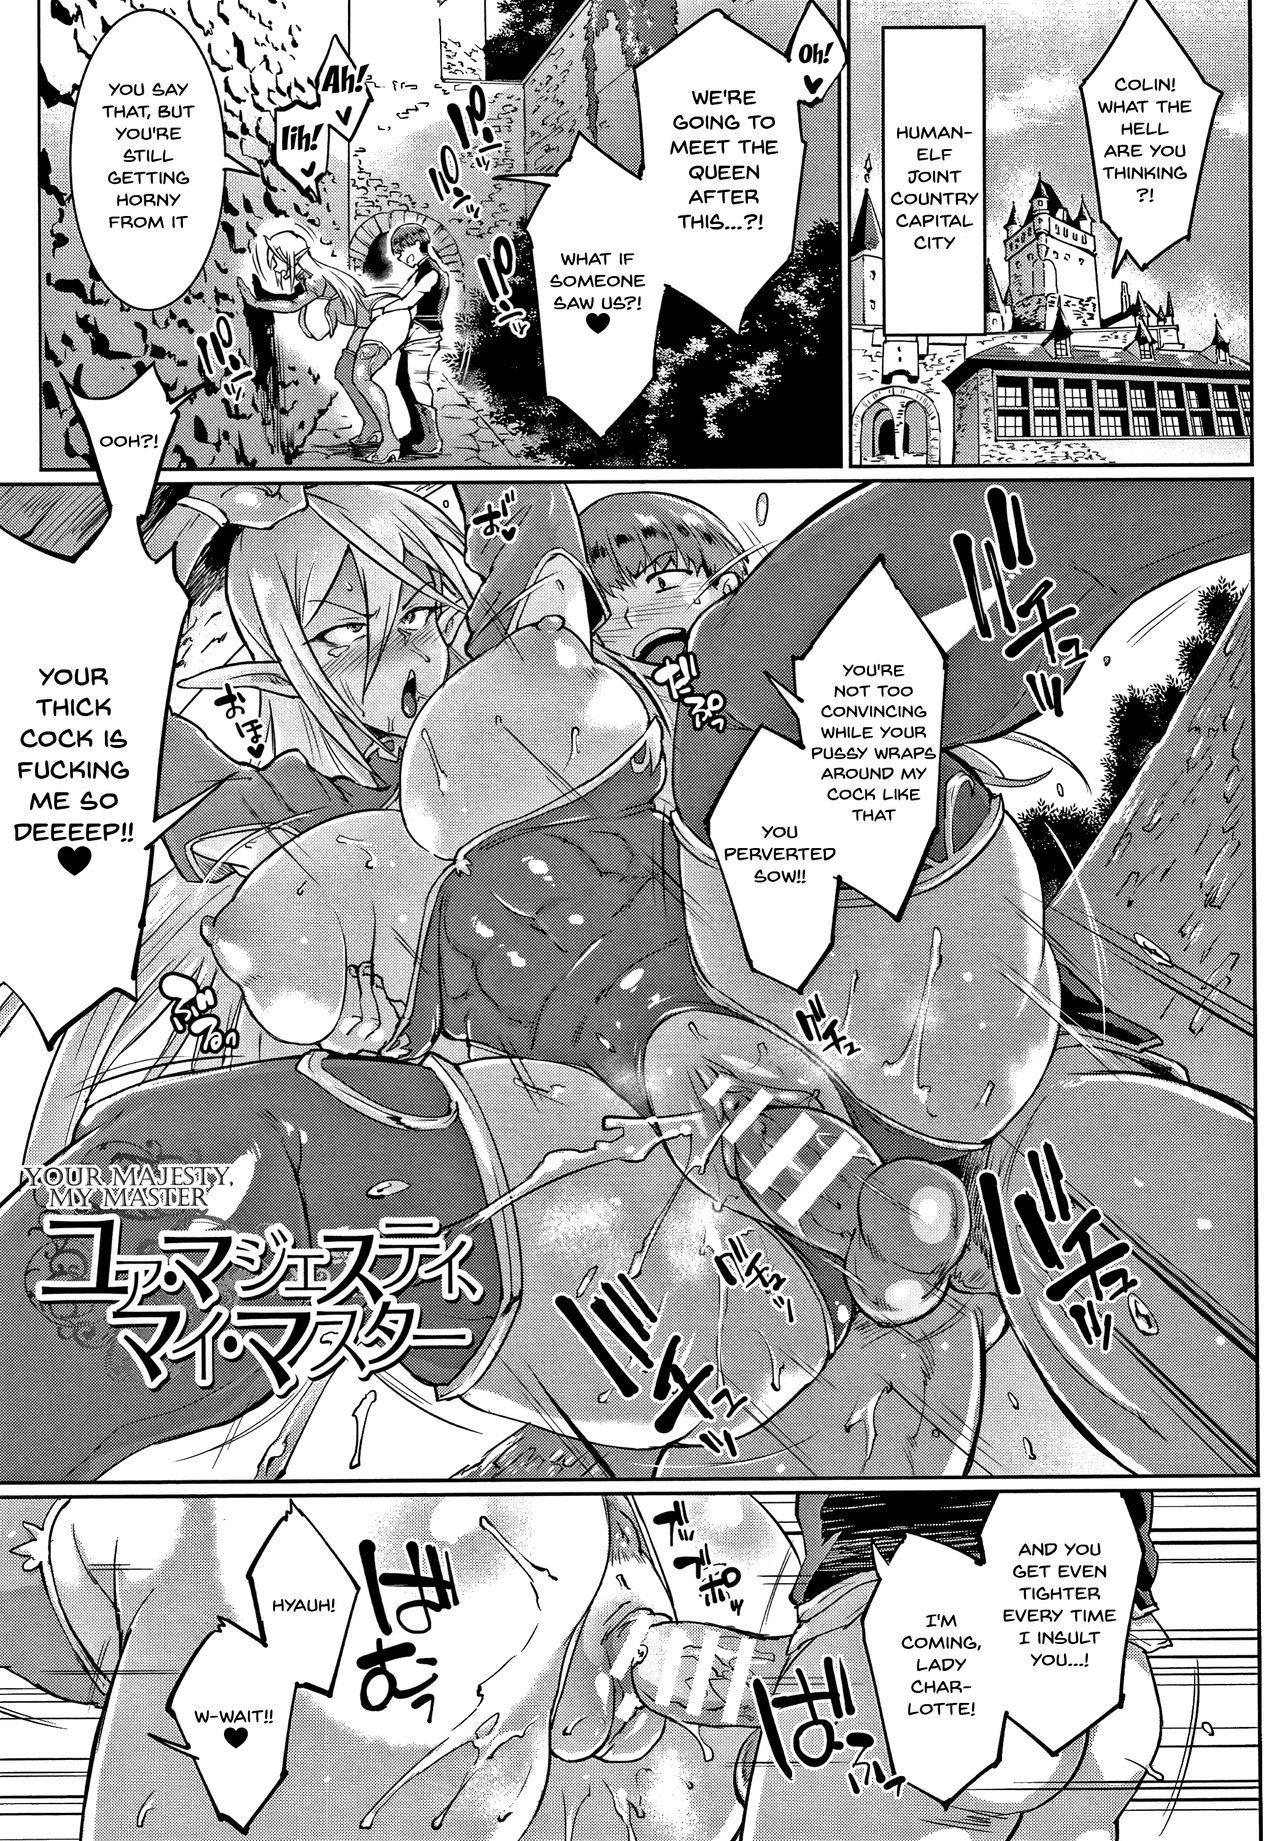 [Fan no Hitori] Sennen Reijou ~ My Lady, My Master ~  Ch.1-3 [English] {Doujins.com} 31